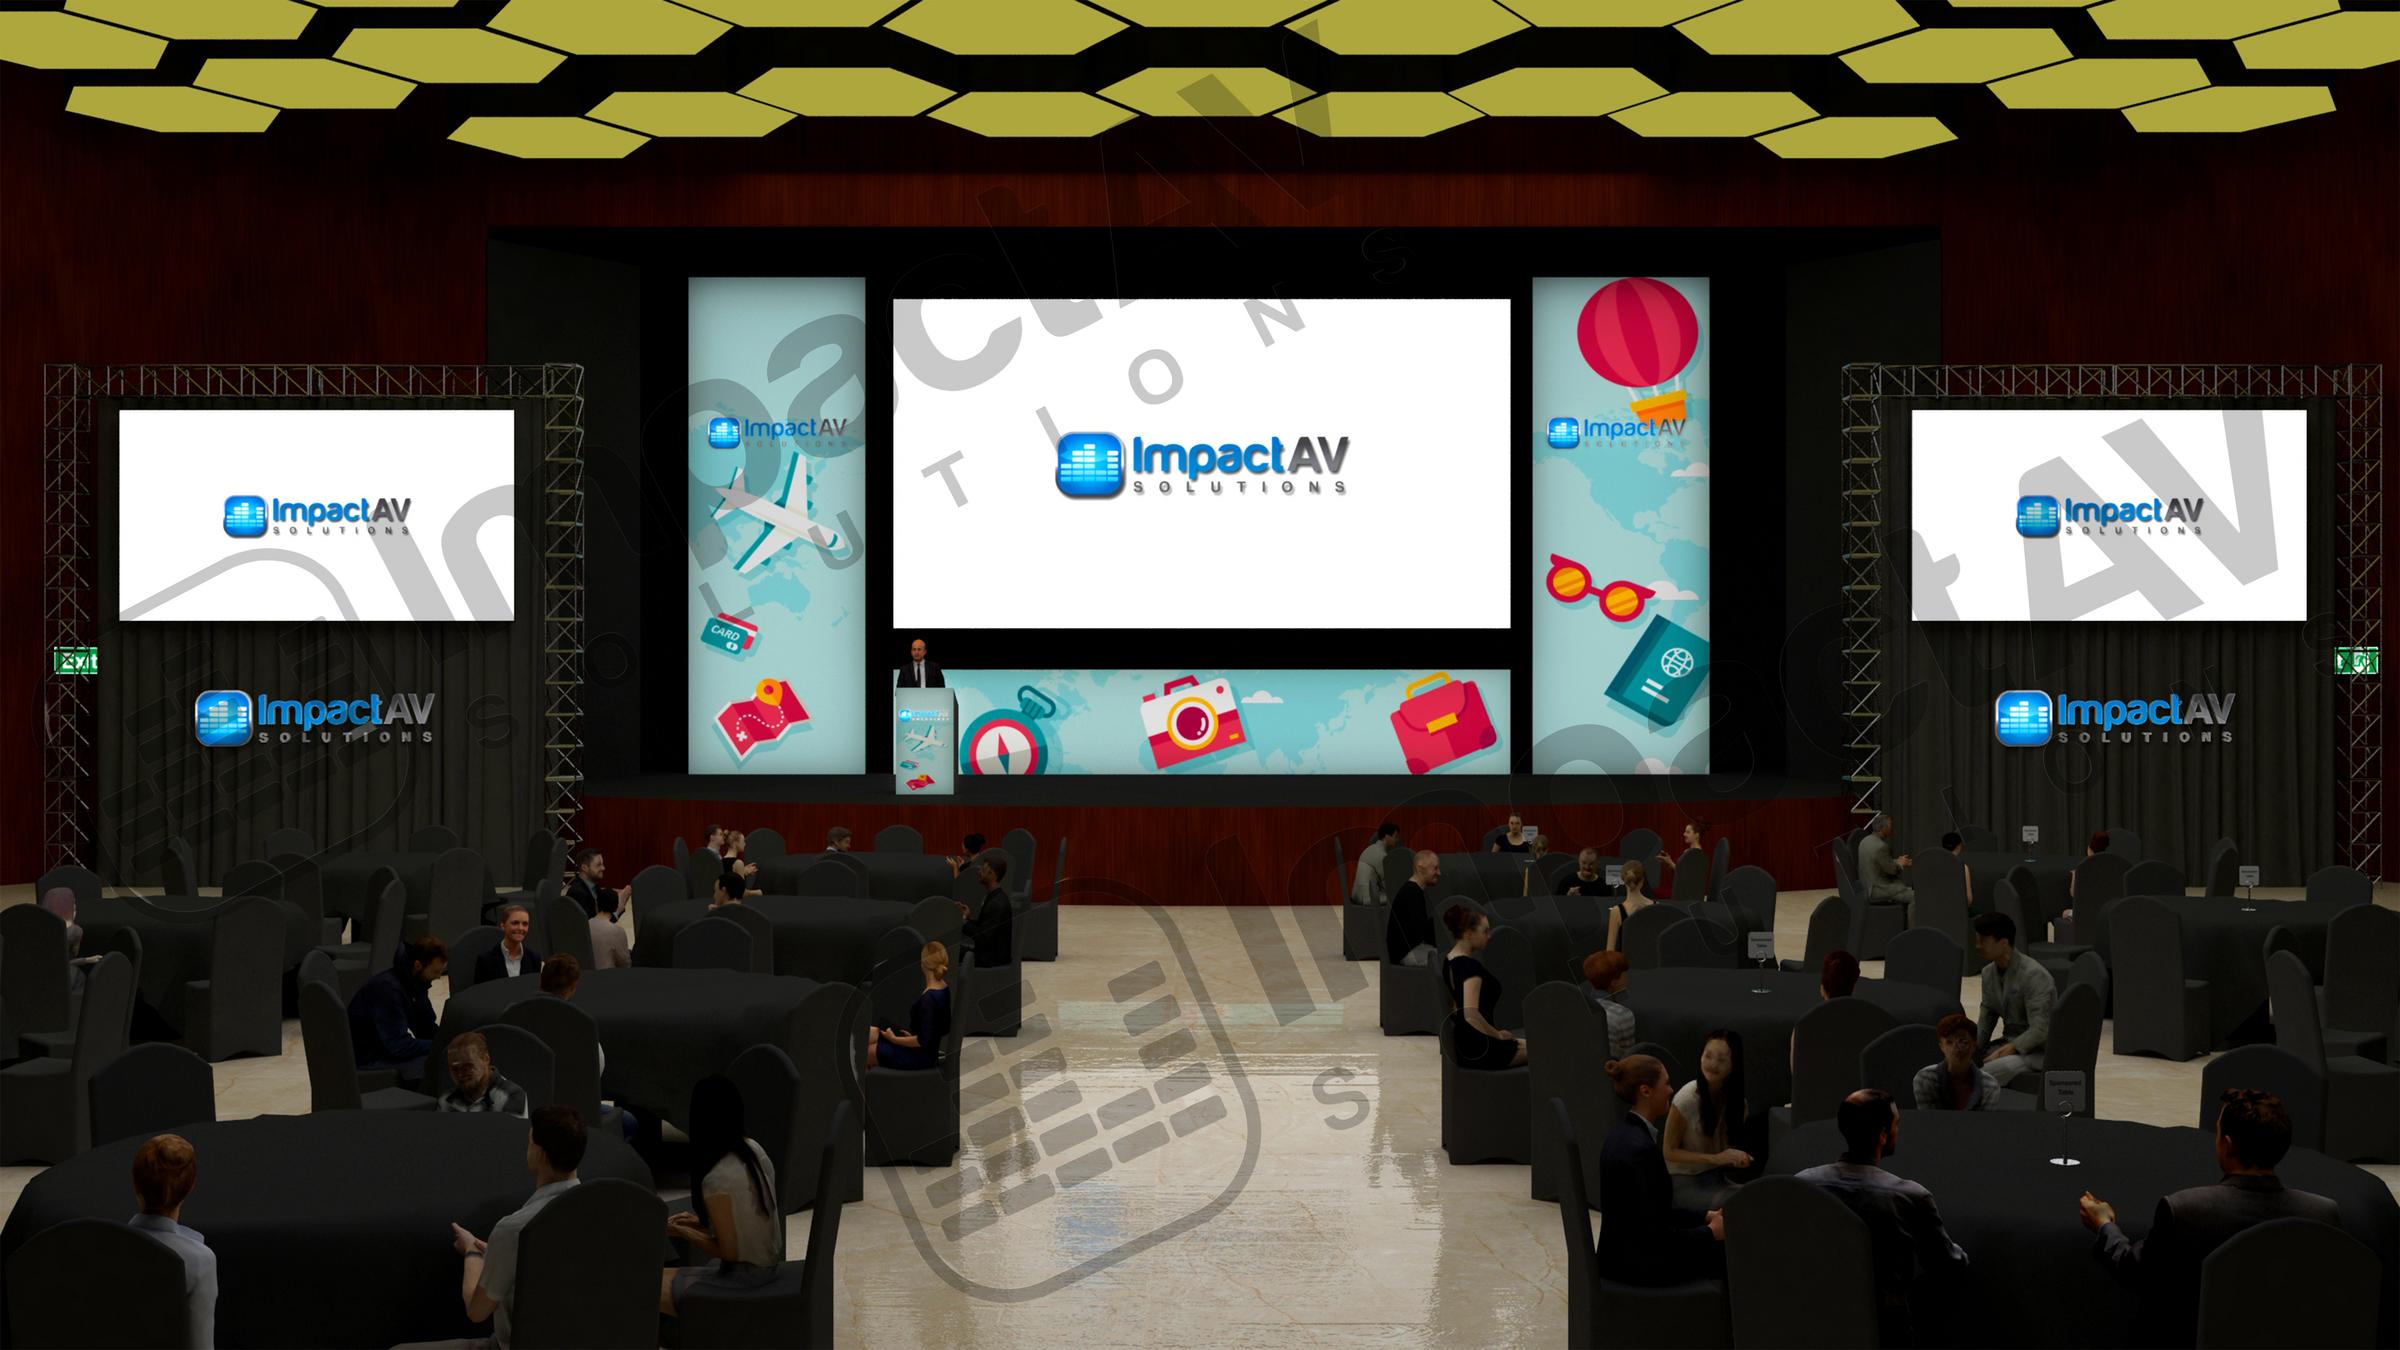 Impact AV Auditorium